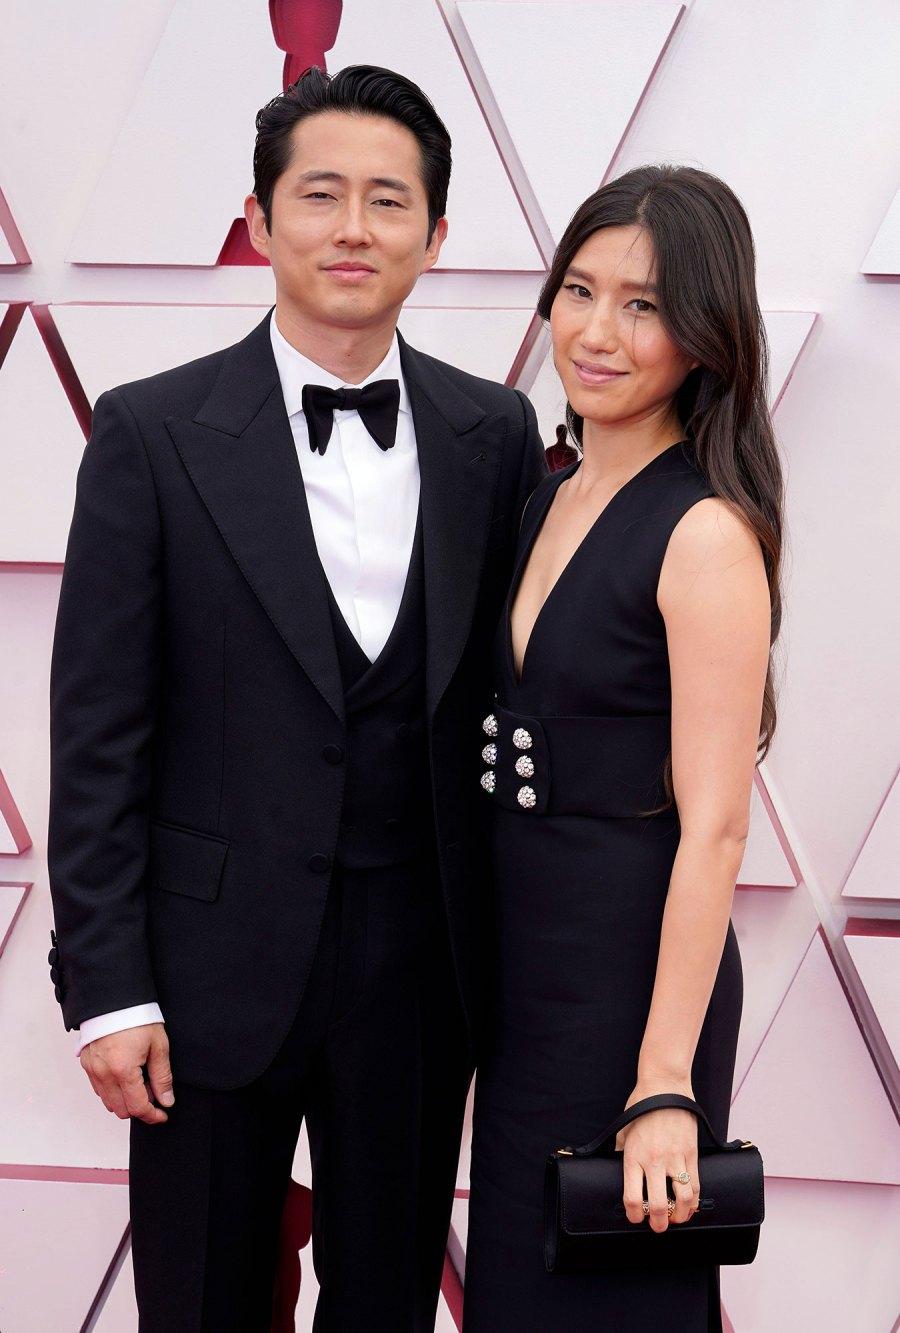 Steven Yeun and Joana Pak Couples Dazzle at Oscars 2021